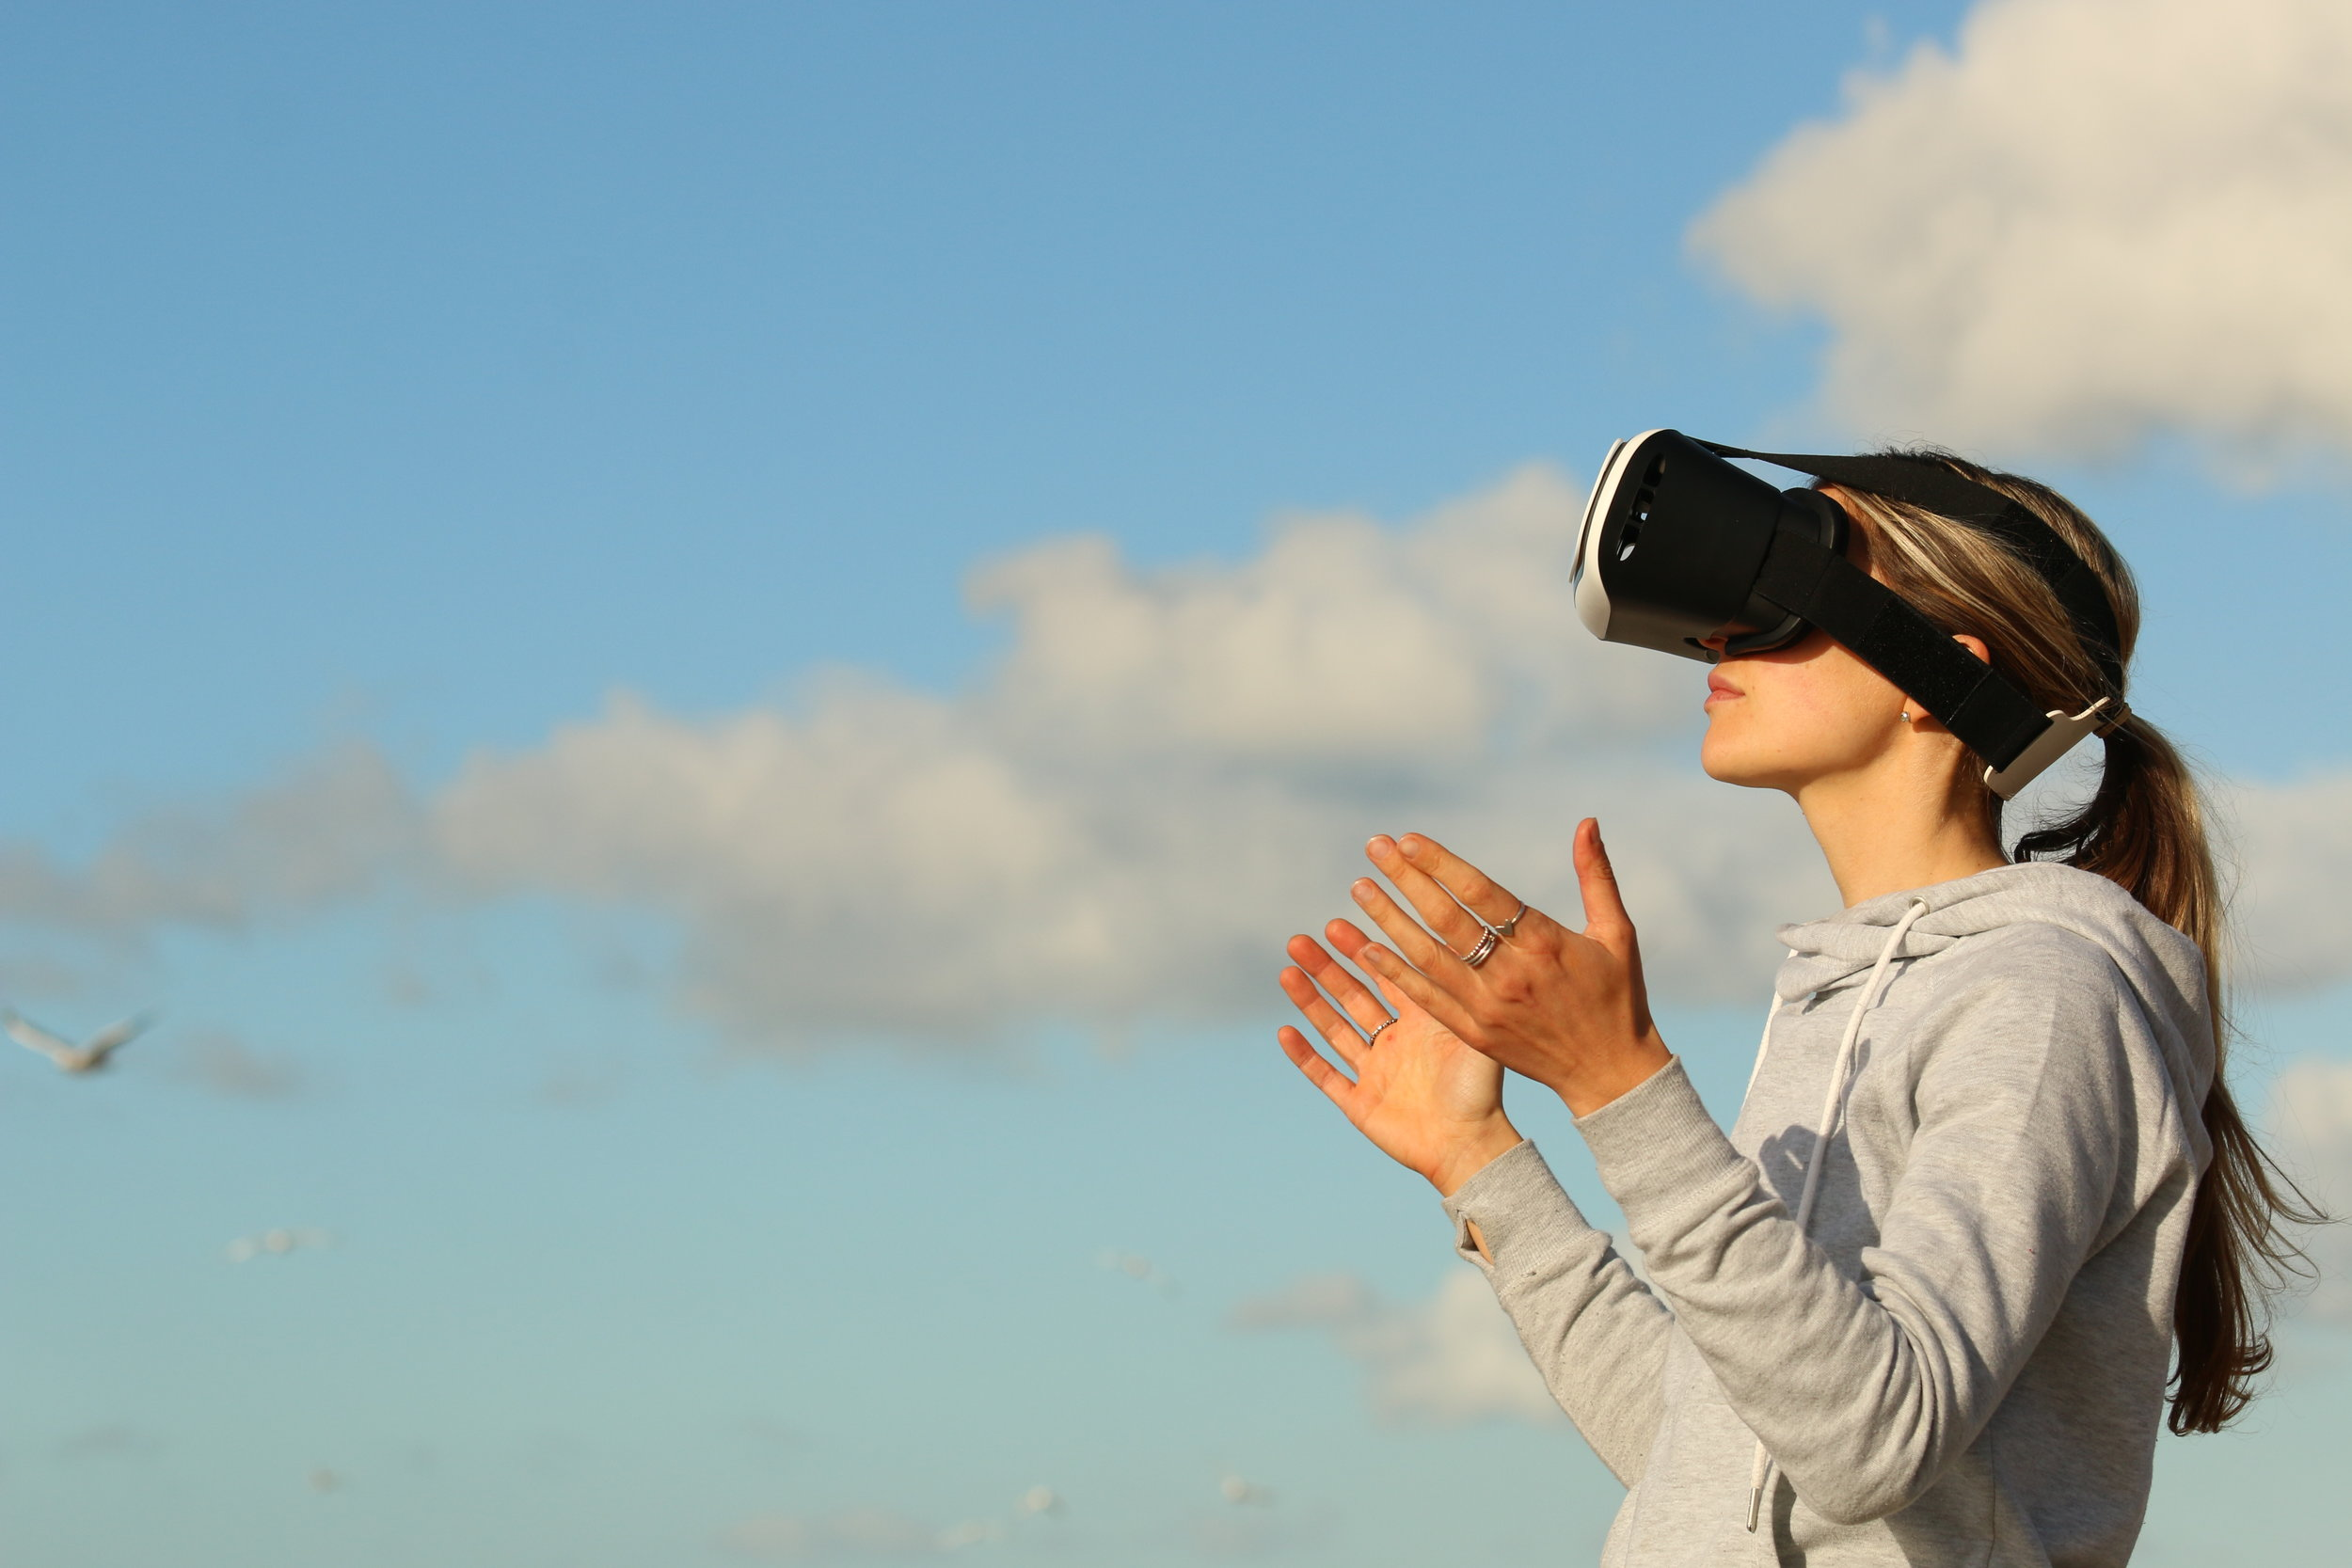 vr-phobies-realite-virtuelle.jpeg